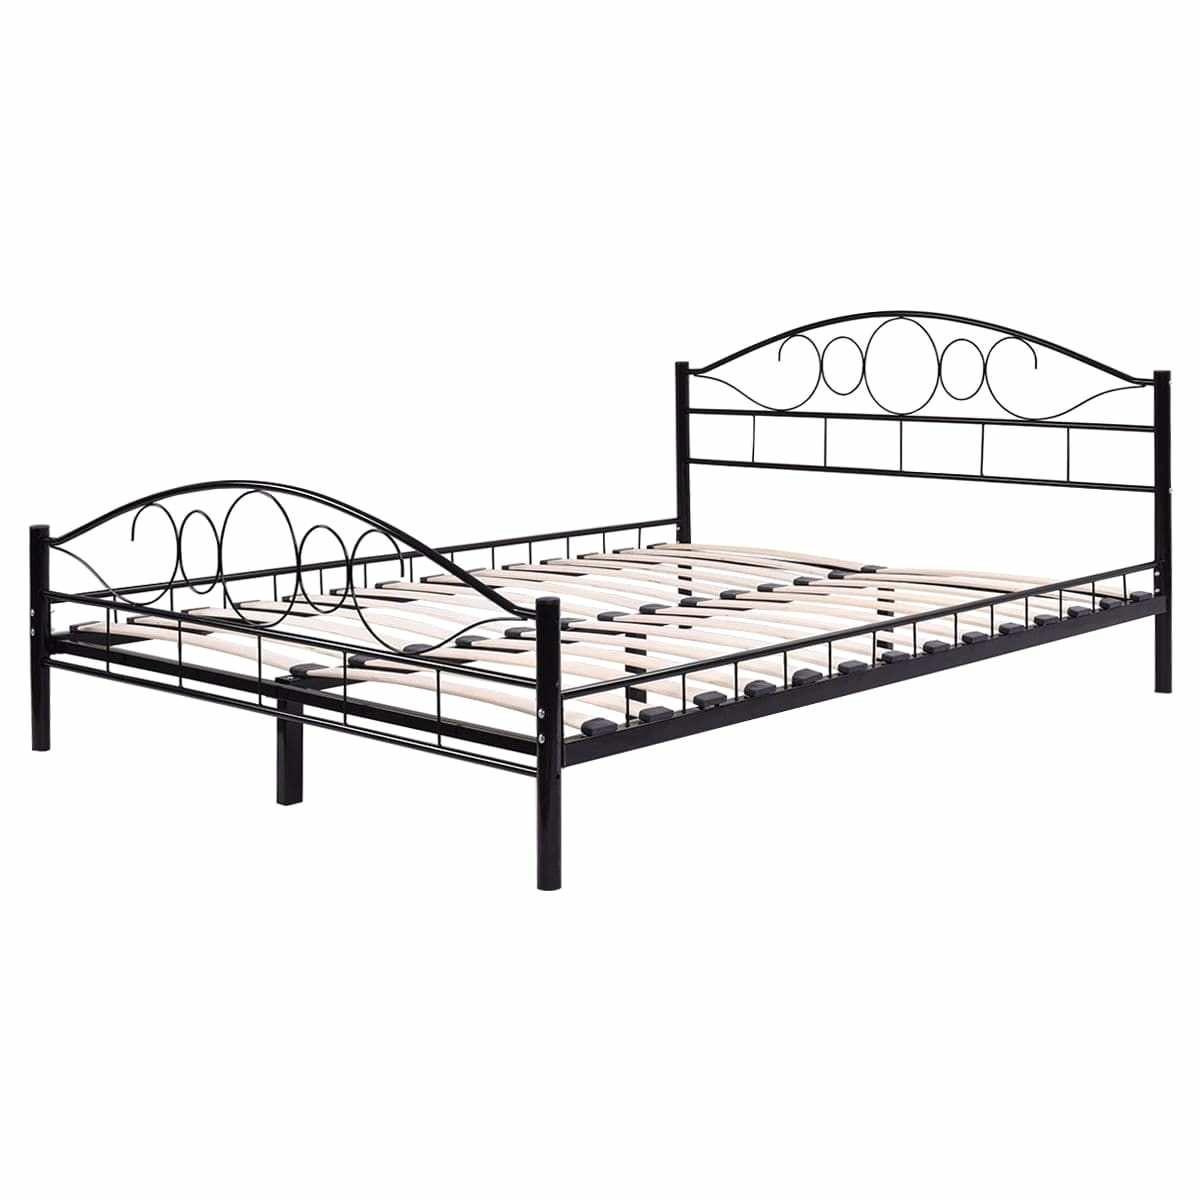 ikea king bed frame beautiful slatted bed base twin beautiful metal frame king tar od slats